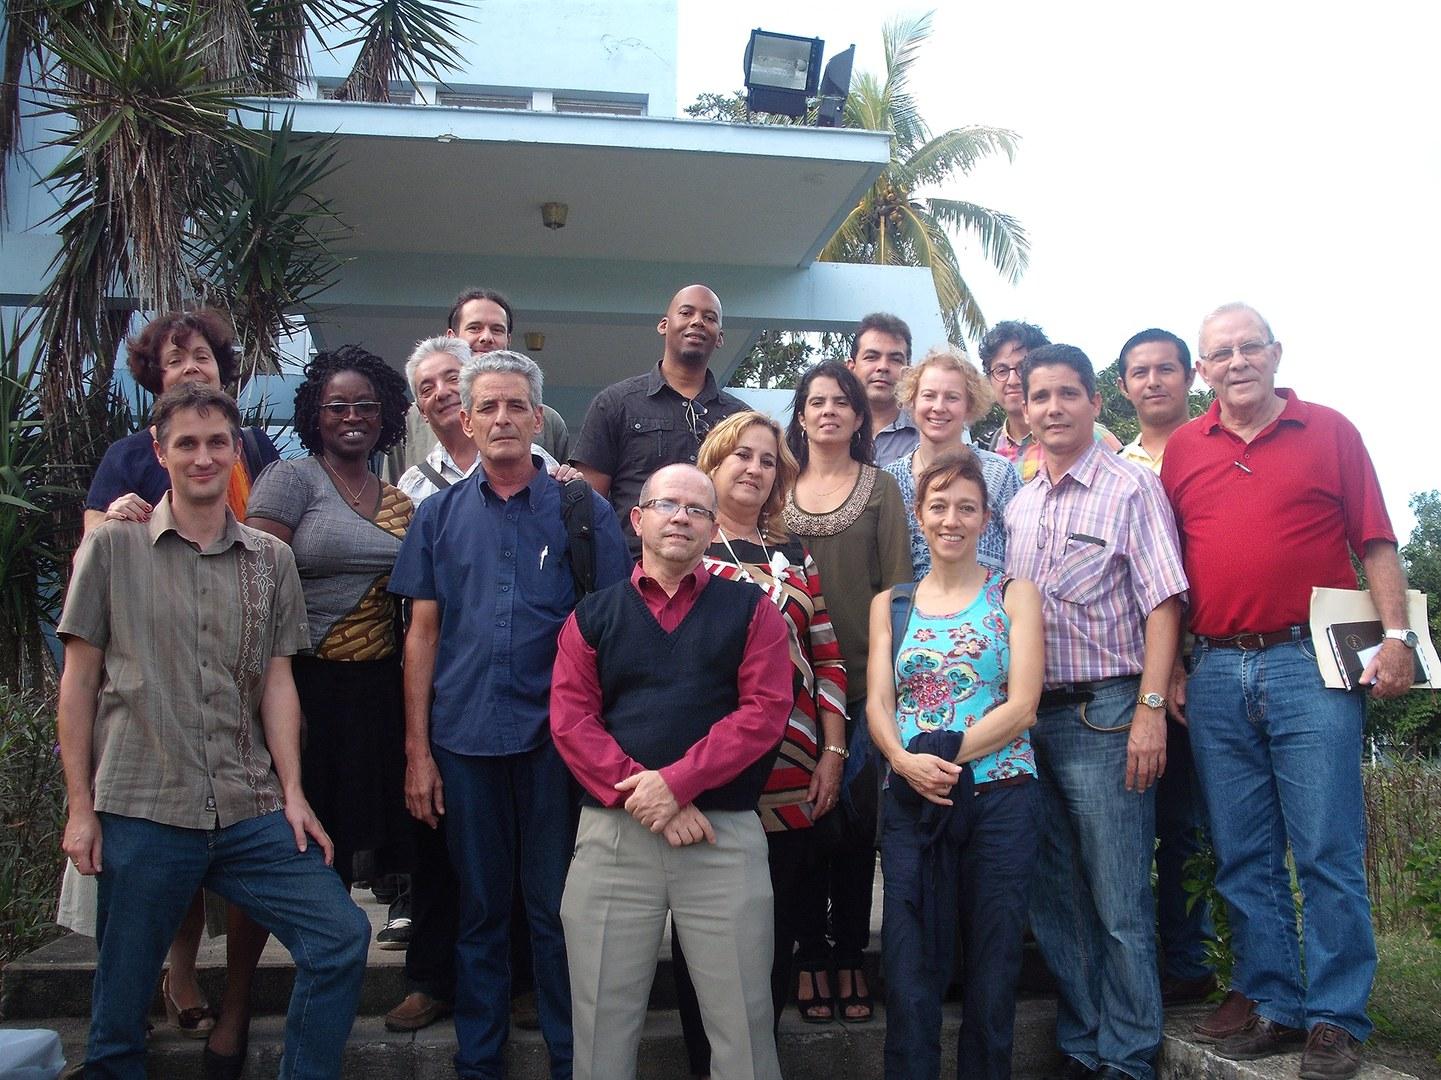 Kooperationspartner der Universitäten Bonn und Santa Clara